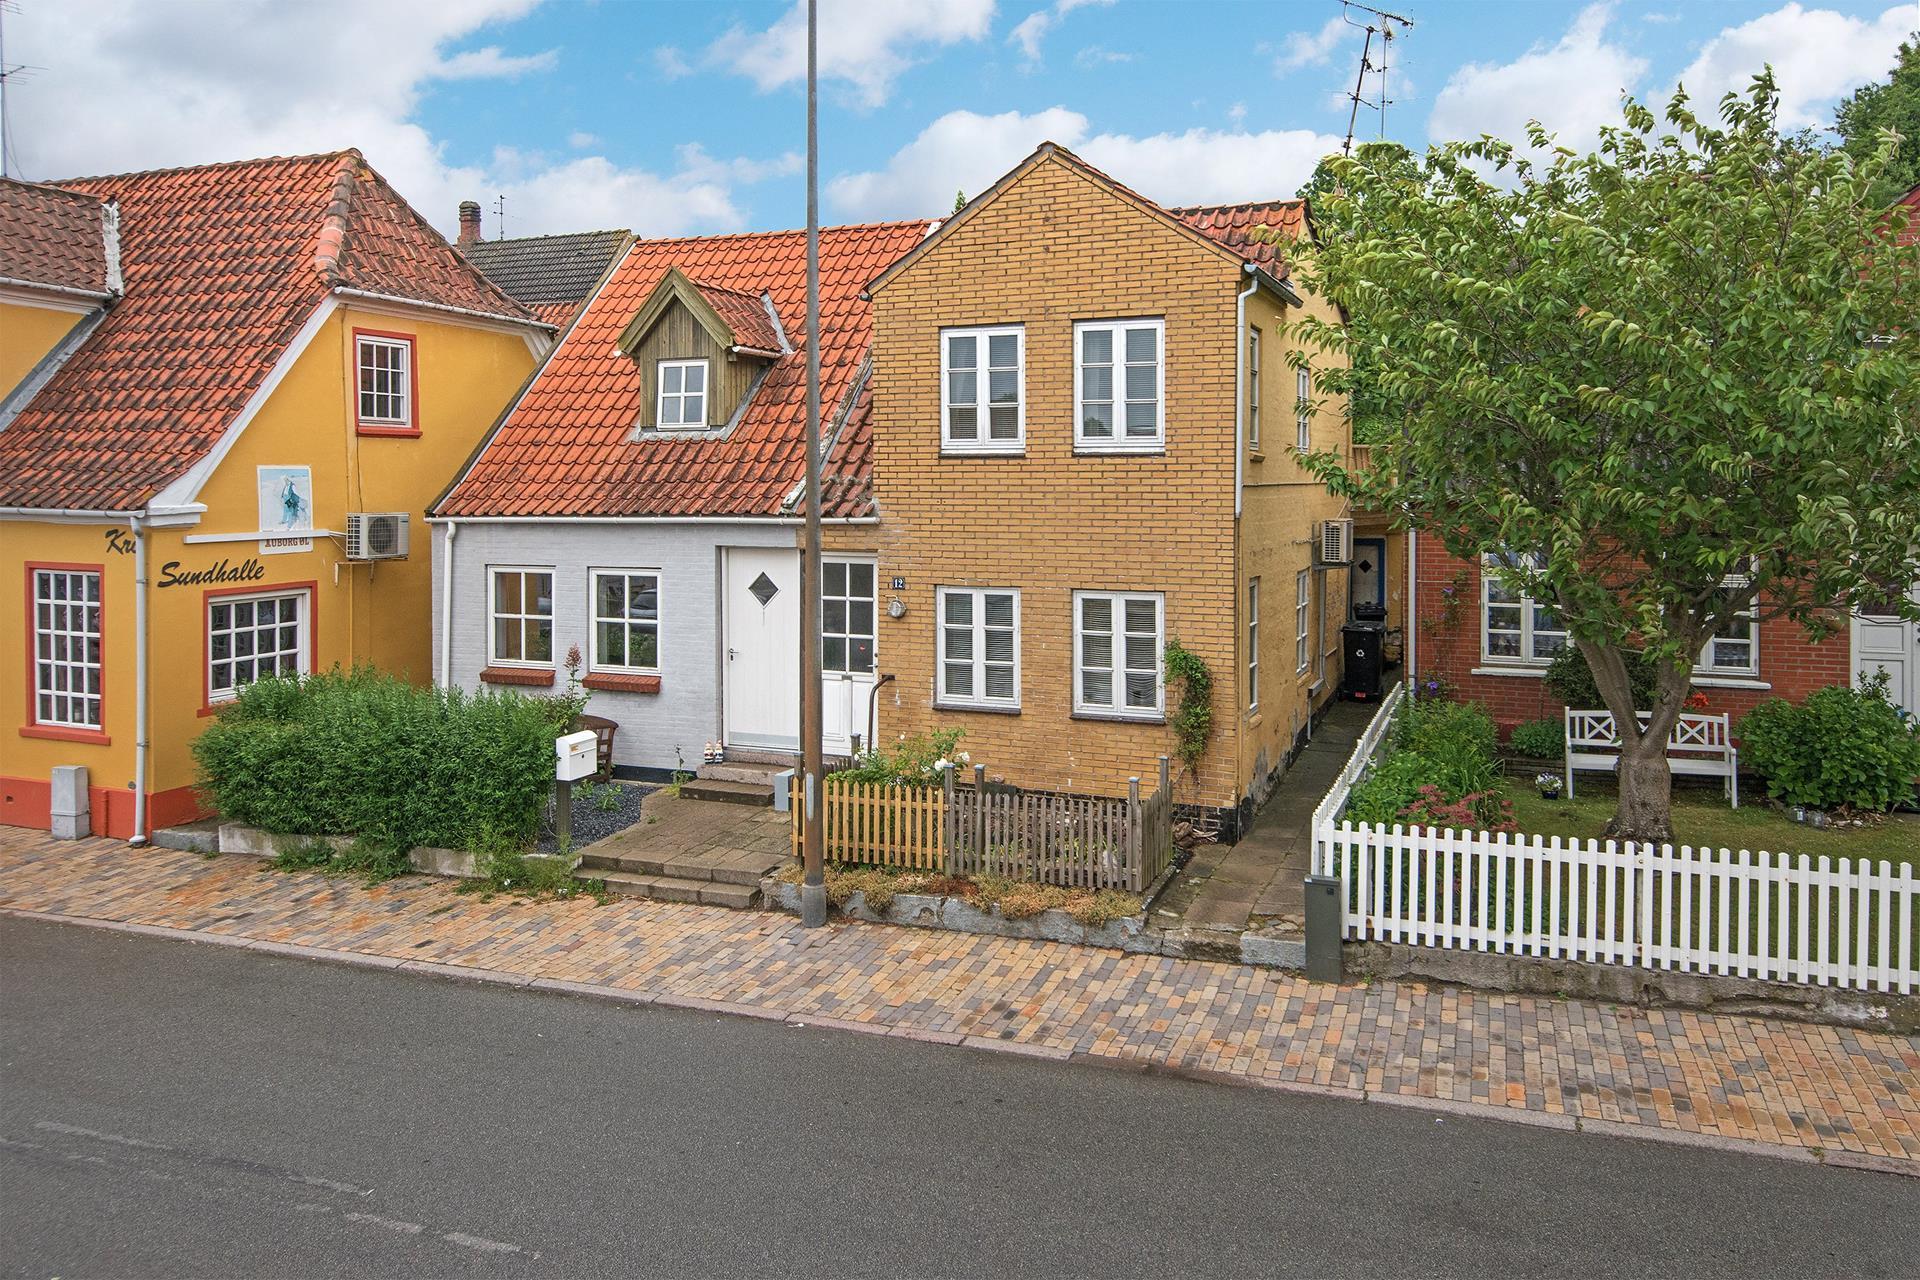 Rækkehus på Sundgade i Sønderborg - Mastefoto